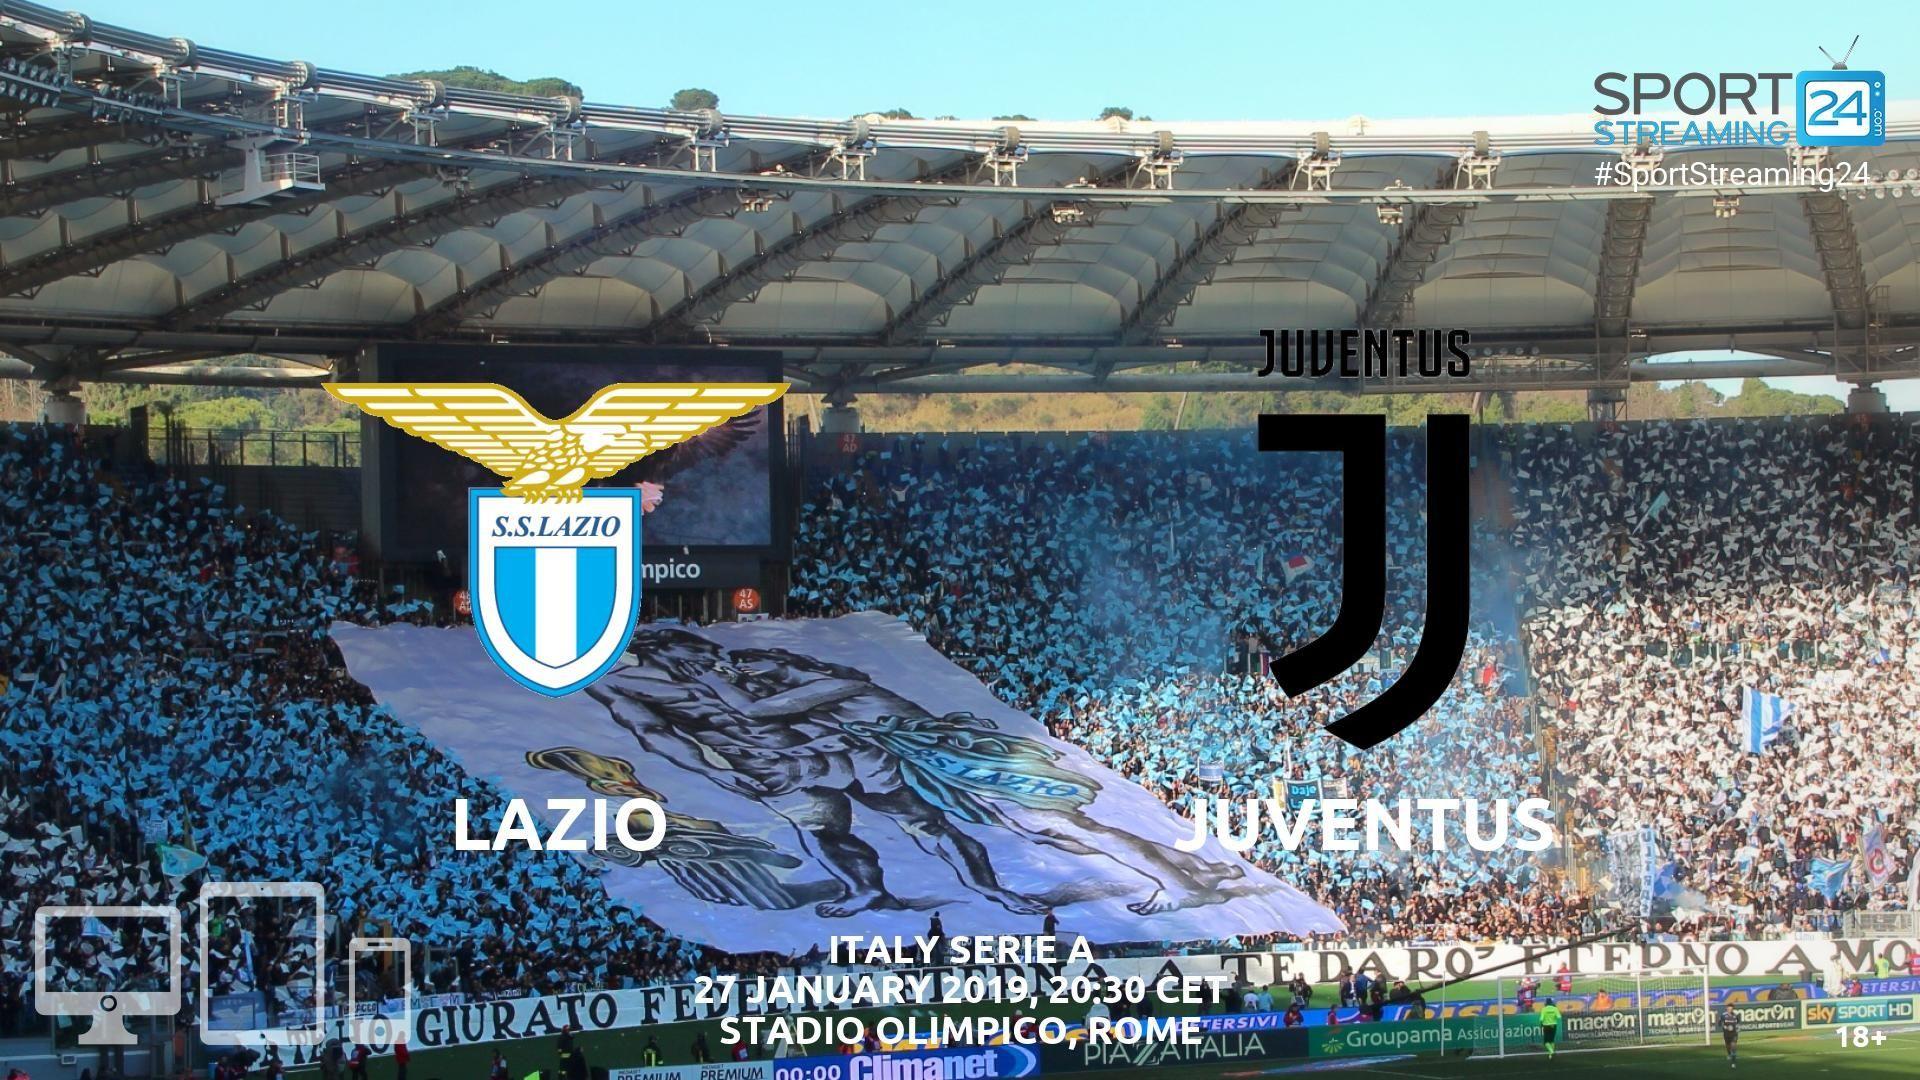 Lazio v Juventus Live Streaming Football Juventus live